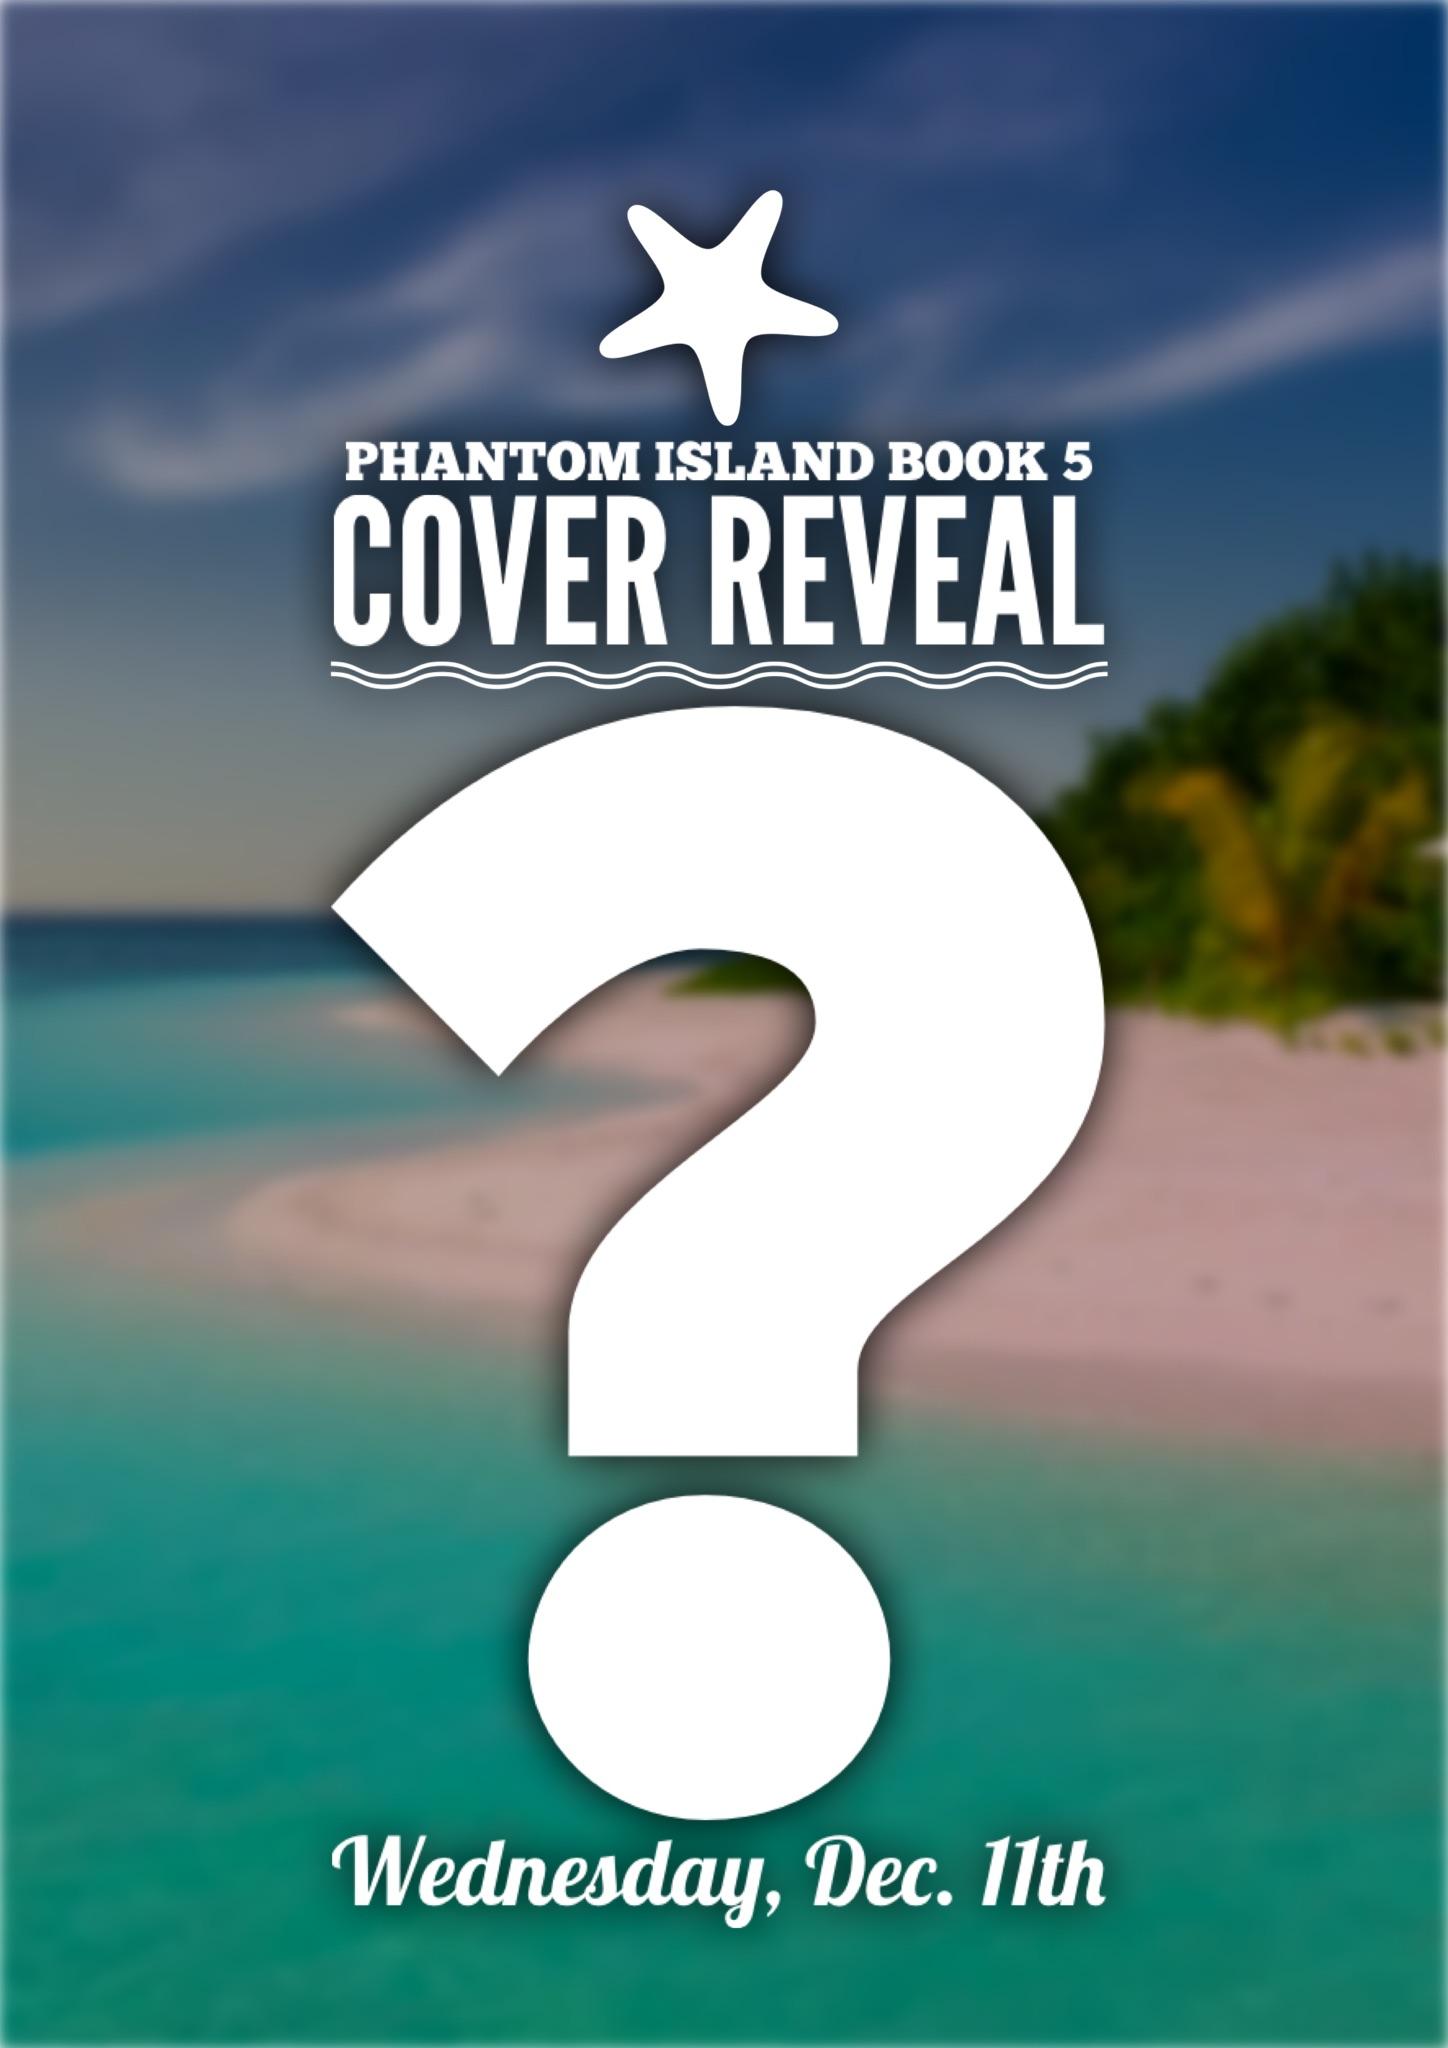 Phantom Island Book 5: Coming in 2020!